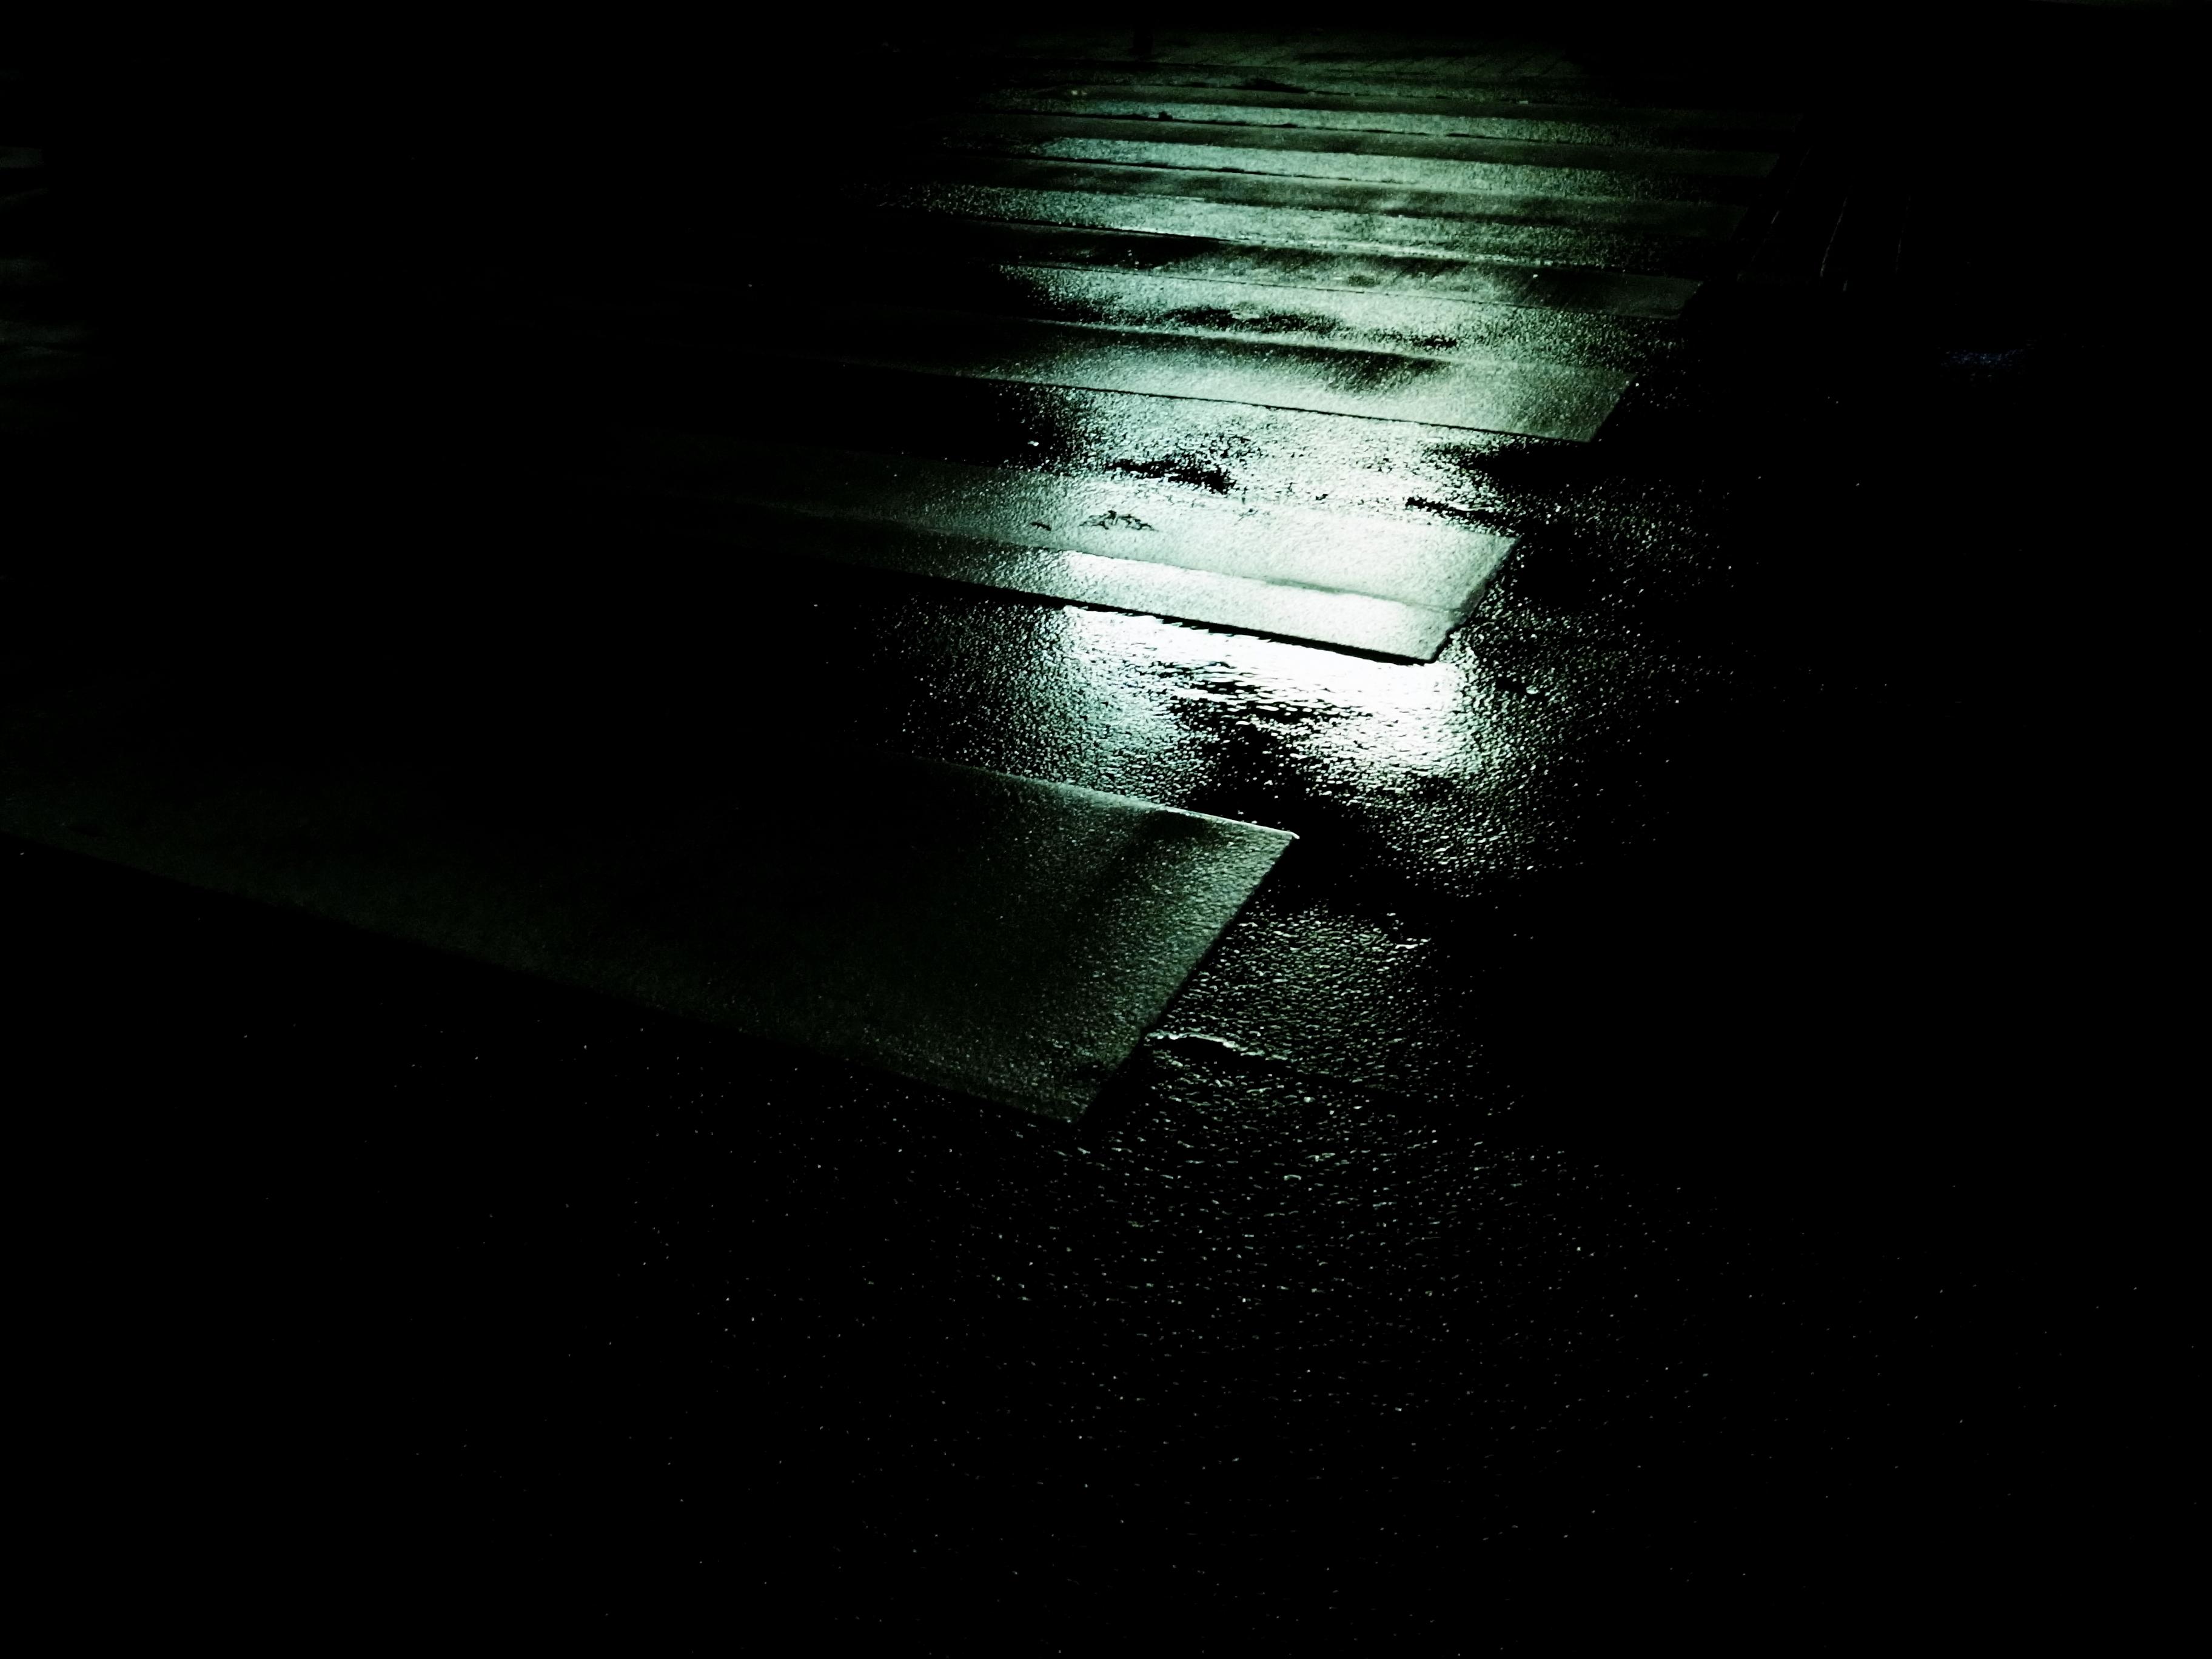 Wallpaper Monochrome Dark Street Night Water Urban Reflection Rain Road Atmosphere Bleach Stripes Walking Midnight Shining Light Walk